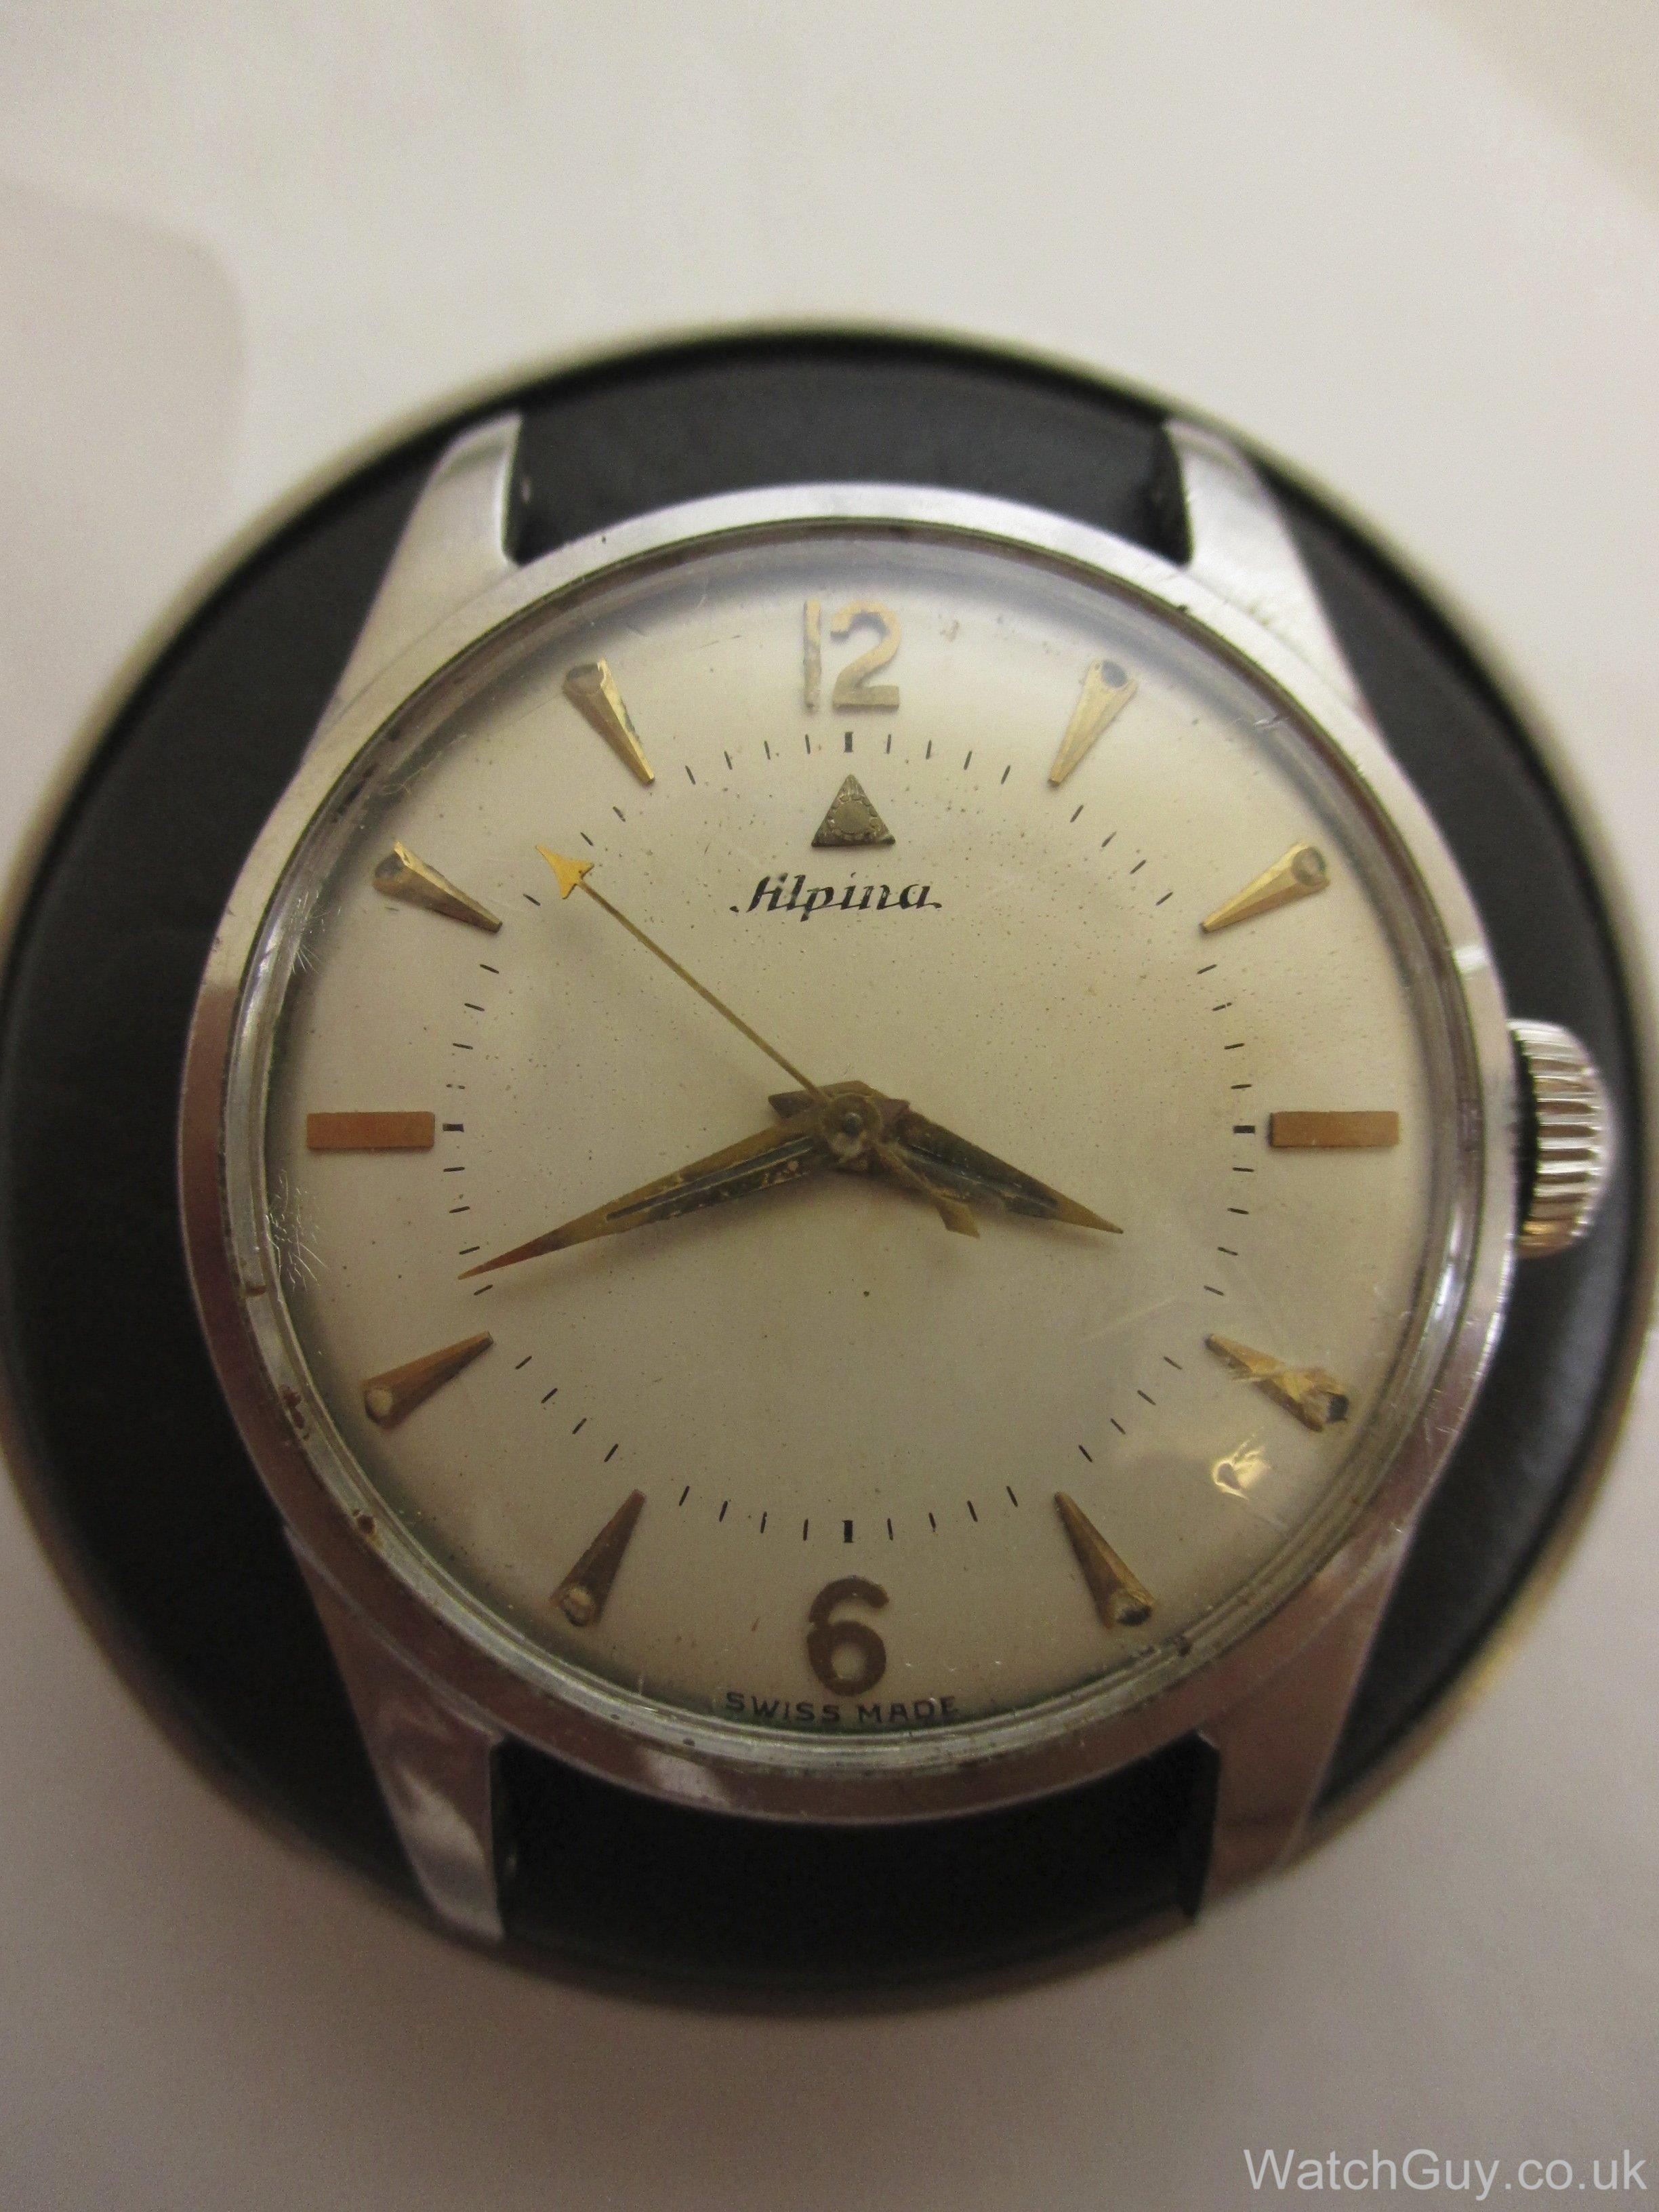 Service Alpina Calibre Watch Guy - Alpina watches price